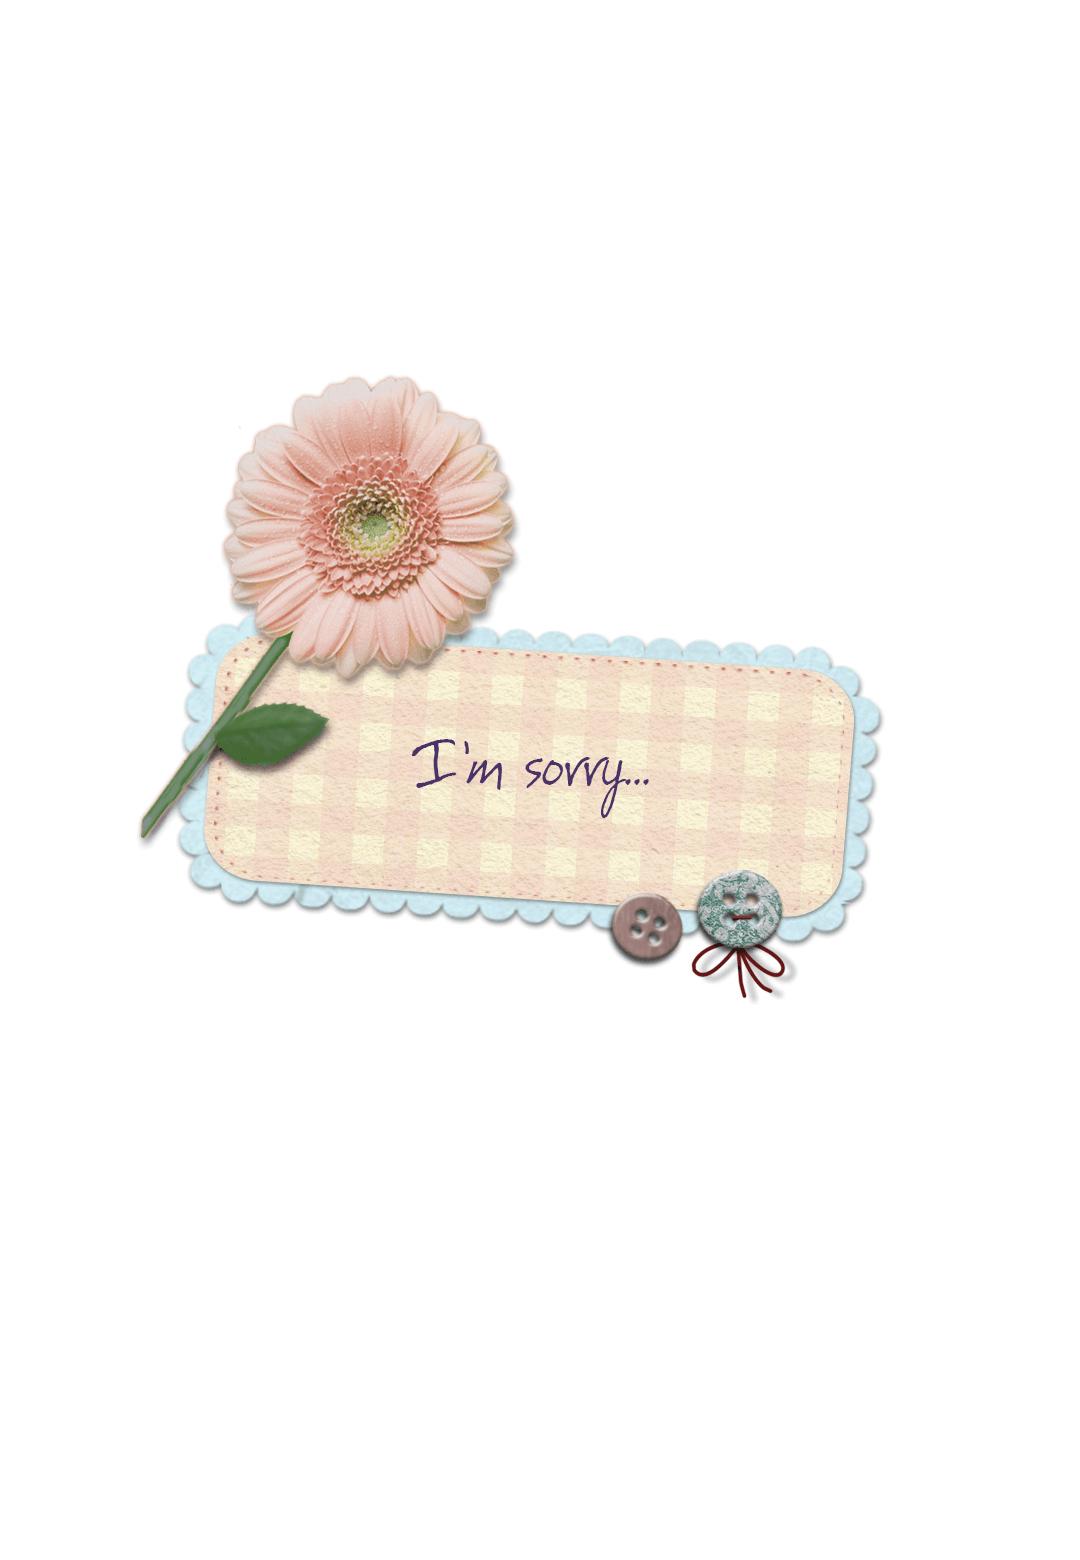 Im Sorry - Free I'm Sorry Card | Greetings Island - Free Printable I Am Sorry Cards